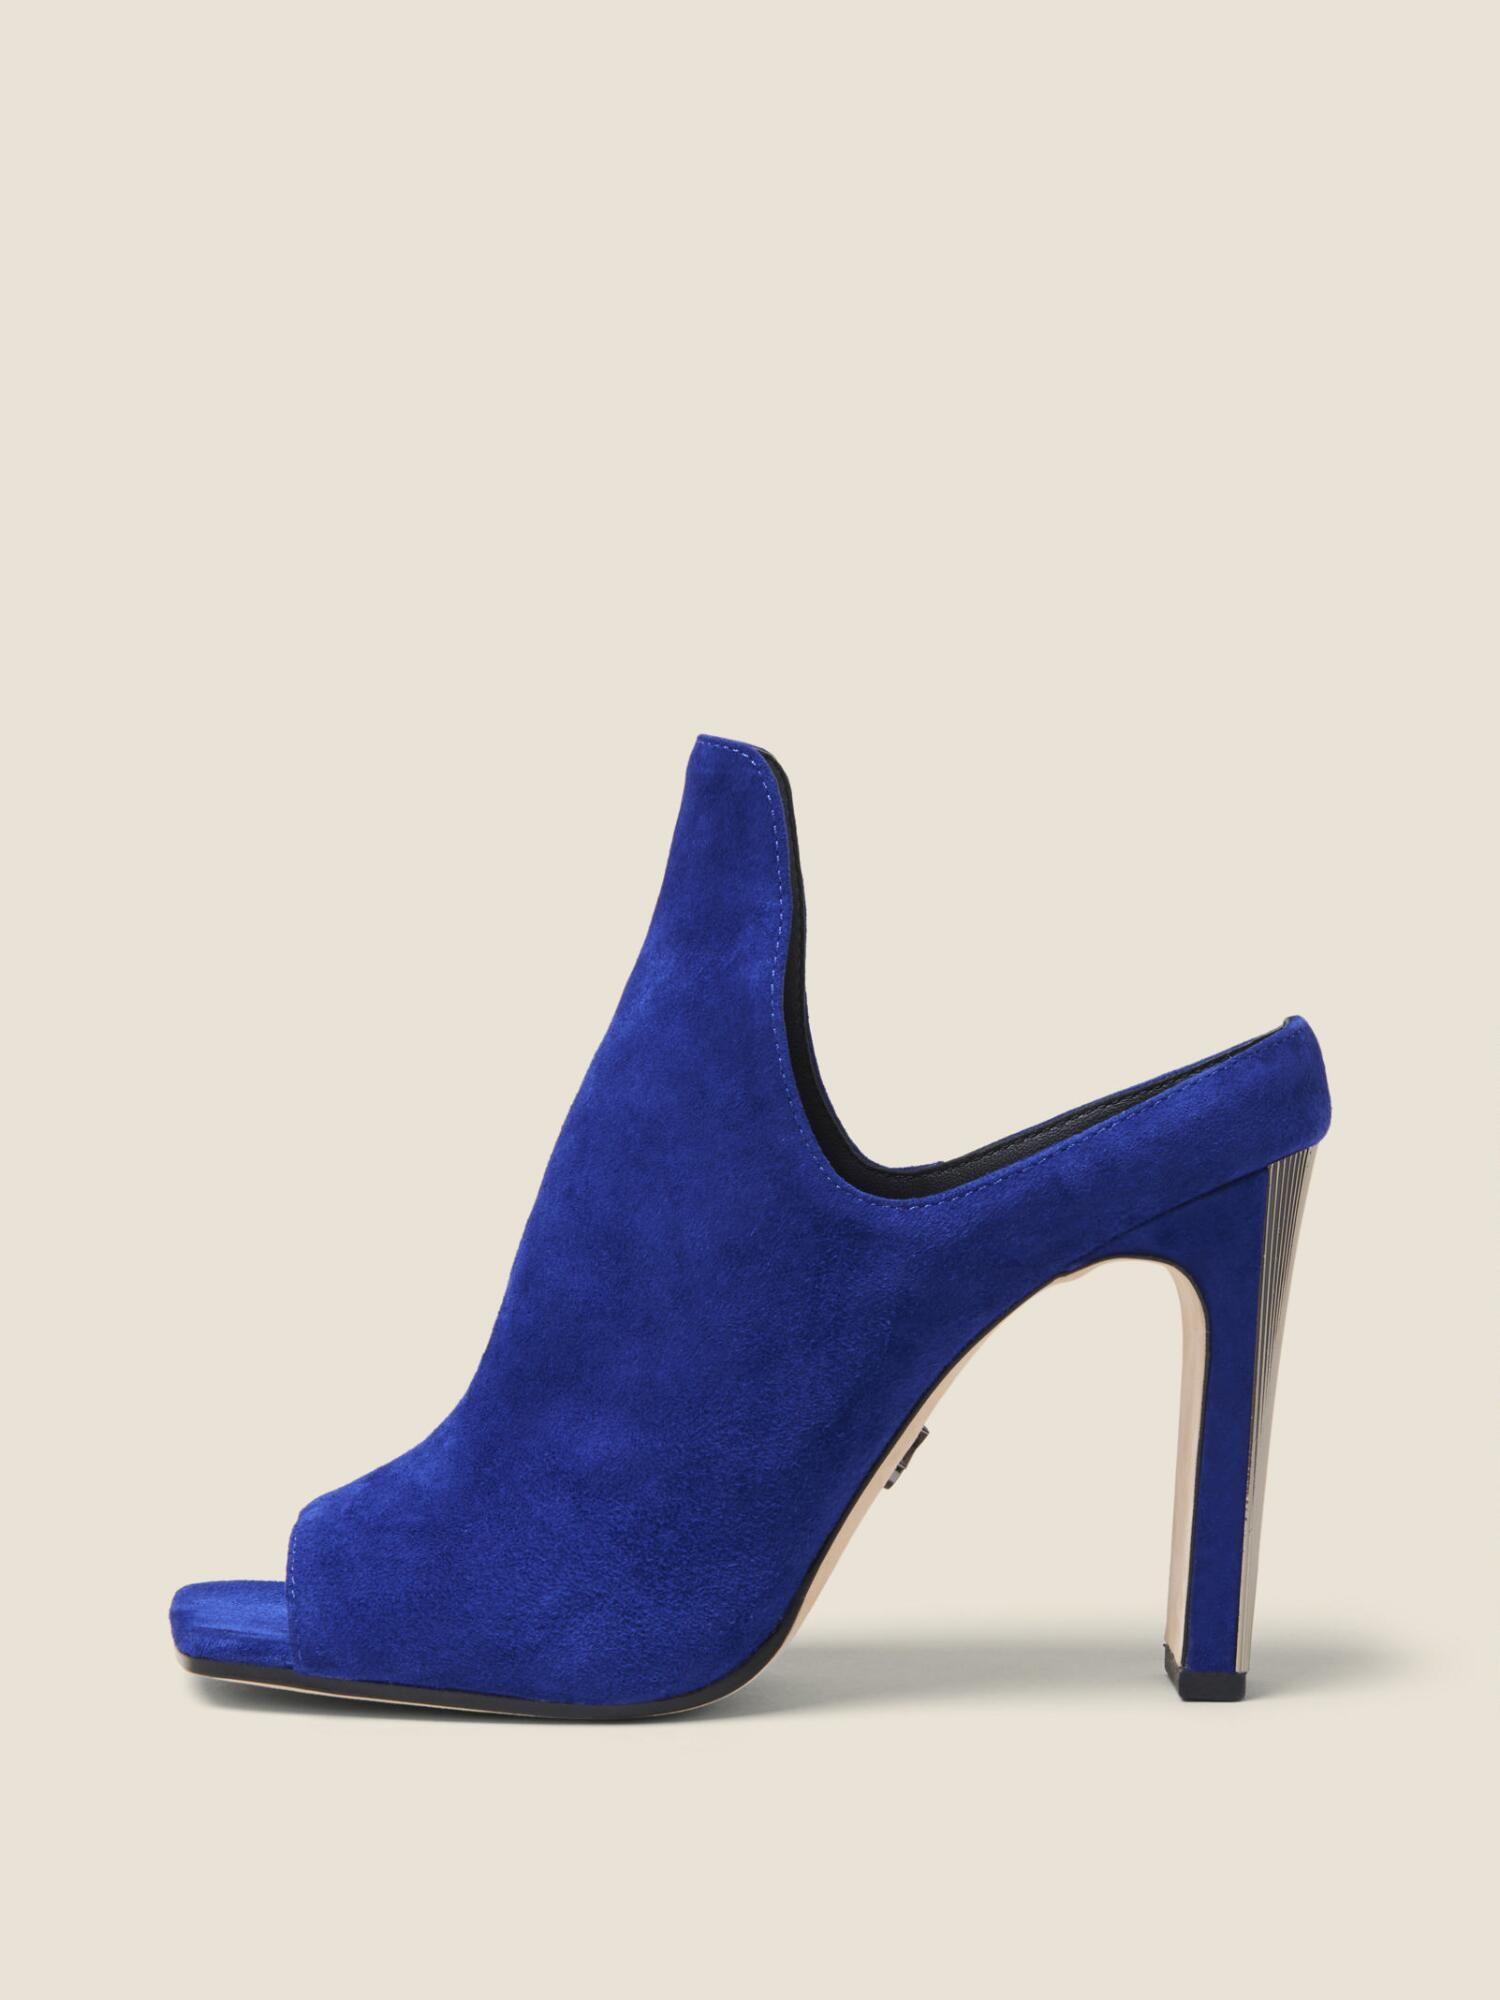 333e25bf90a4f Love this by DONNA KARAN Sutton Suede Mule, Sapphire - $159 (36%Off ...